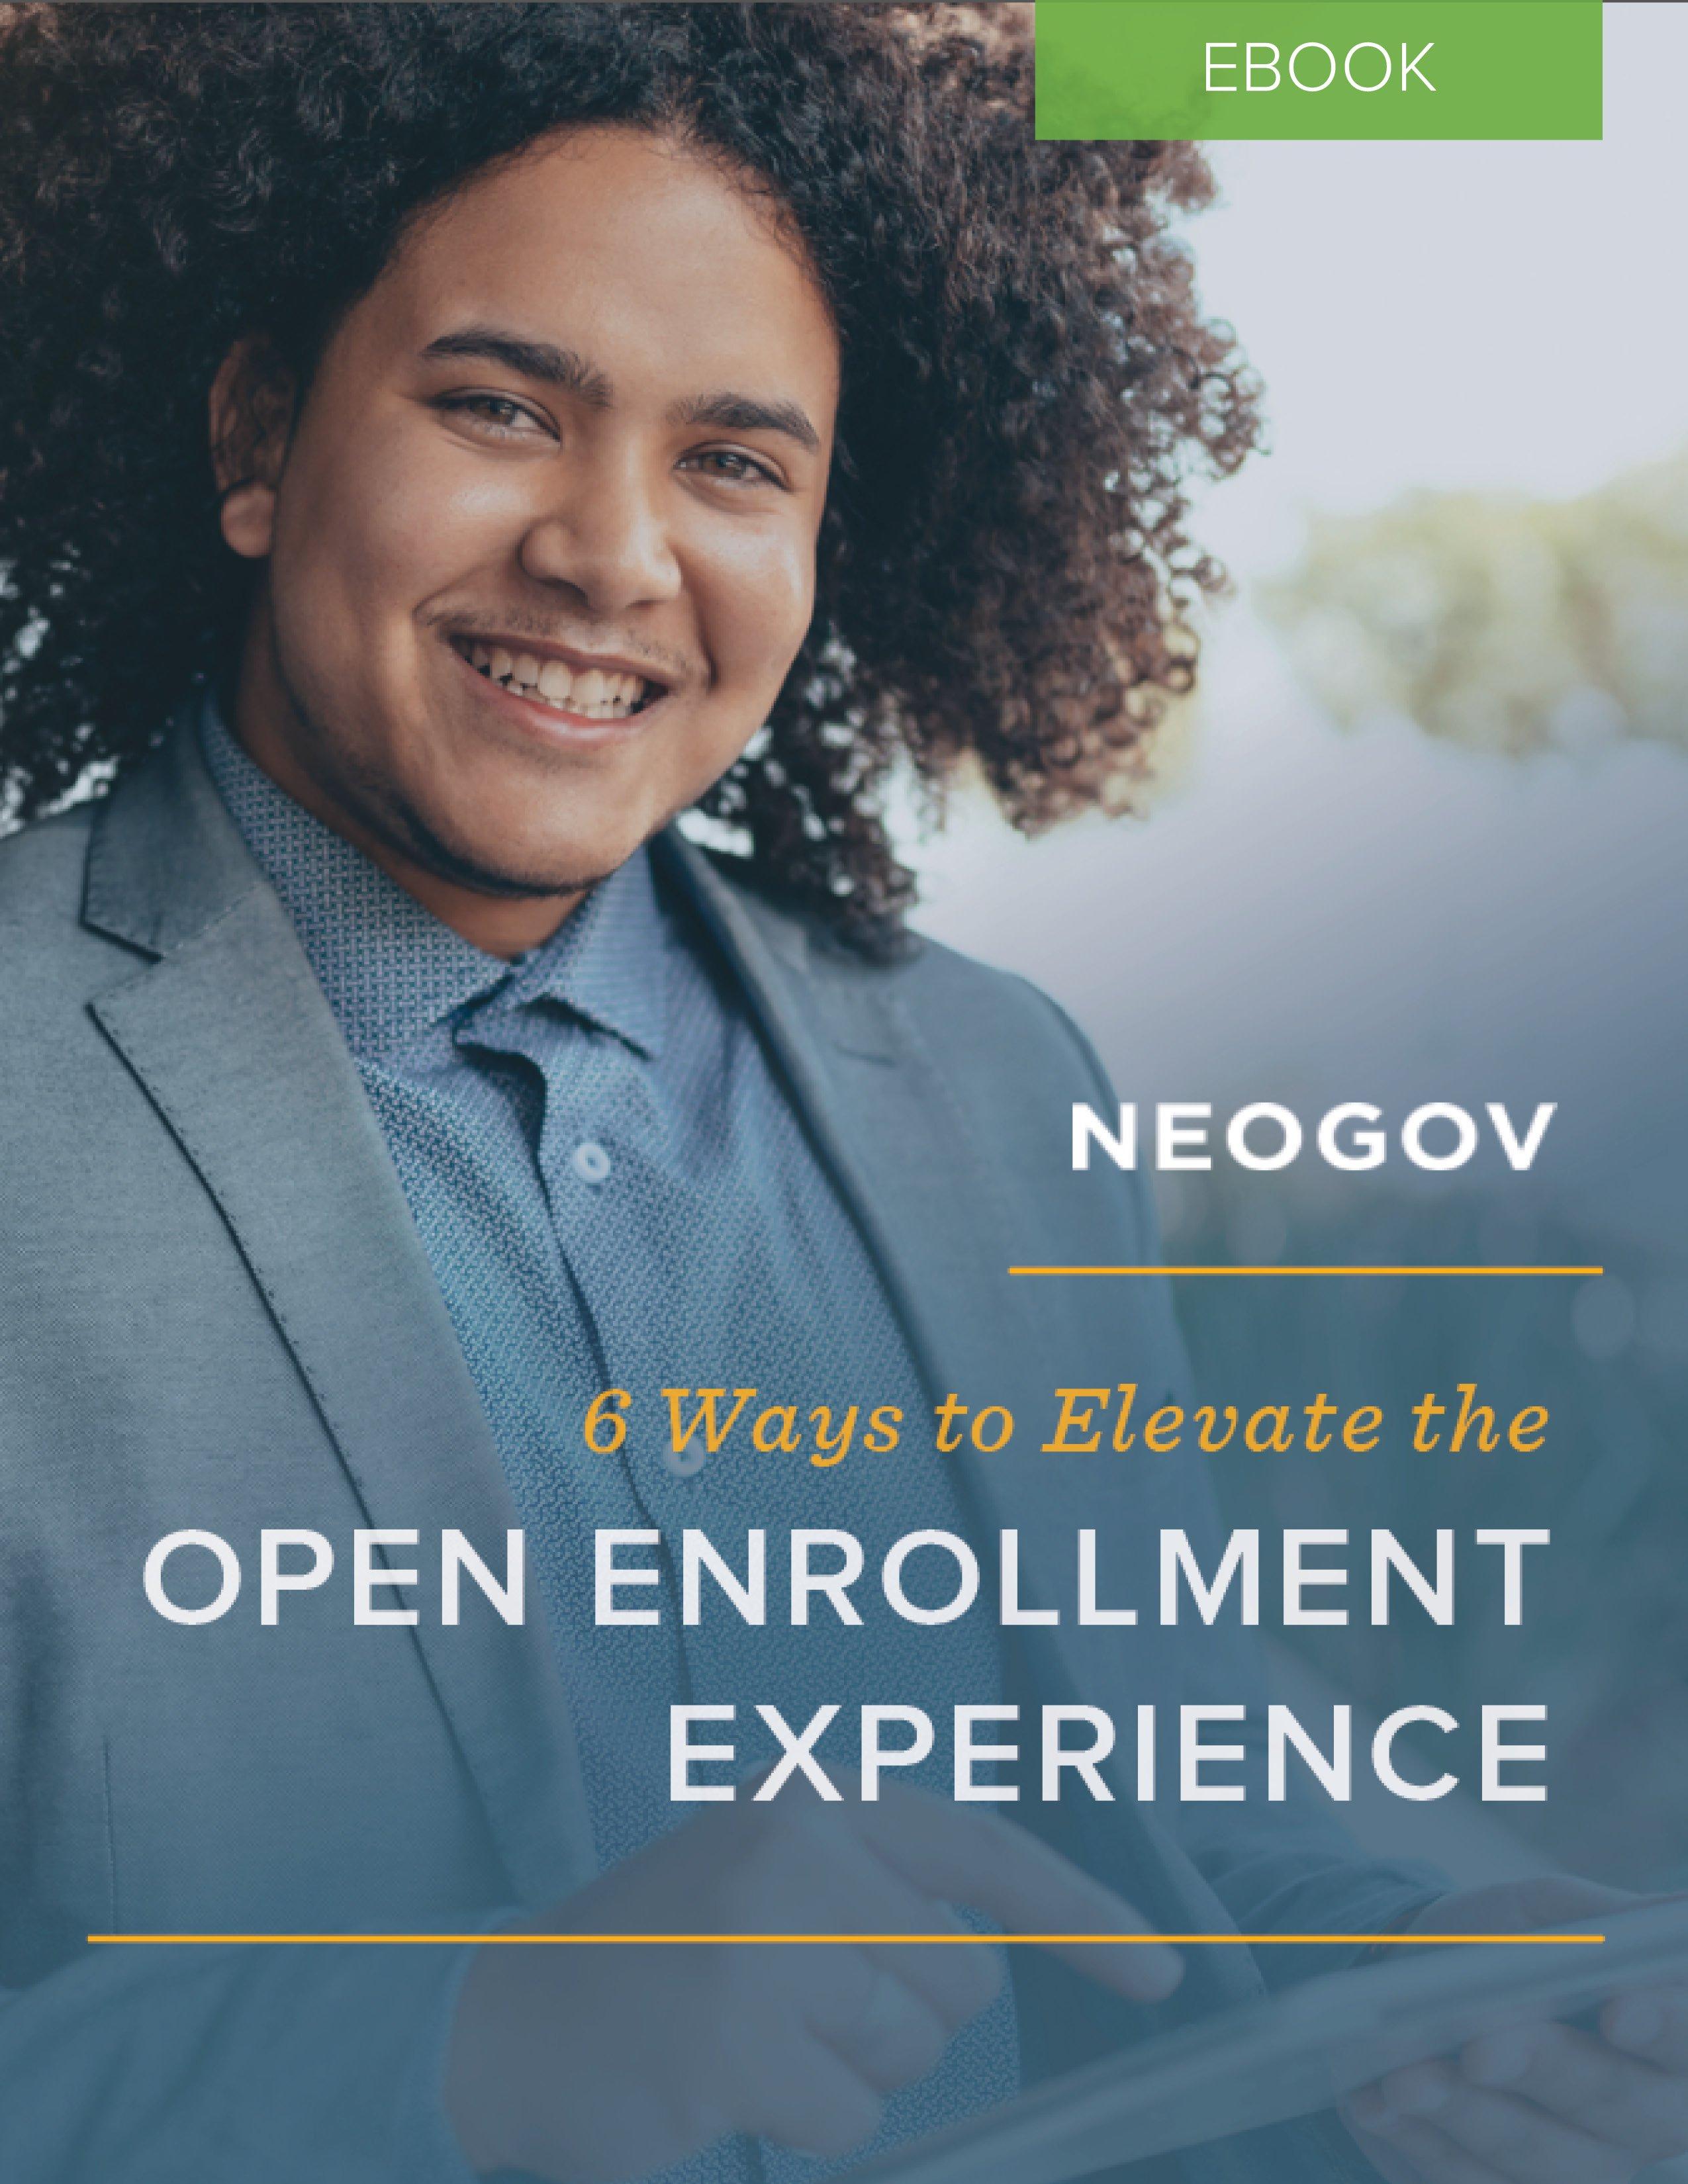 NEOGOV Open Enrollment Experience eBook